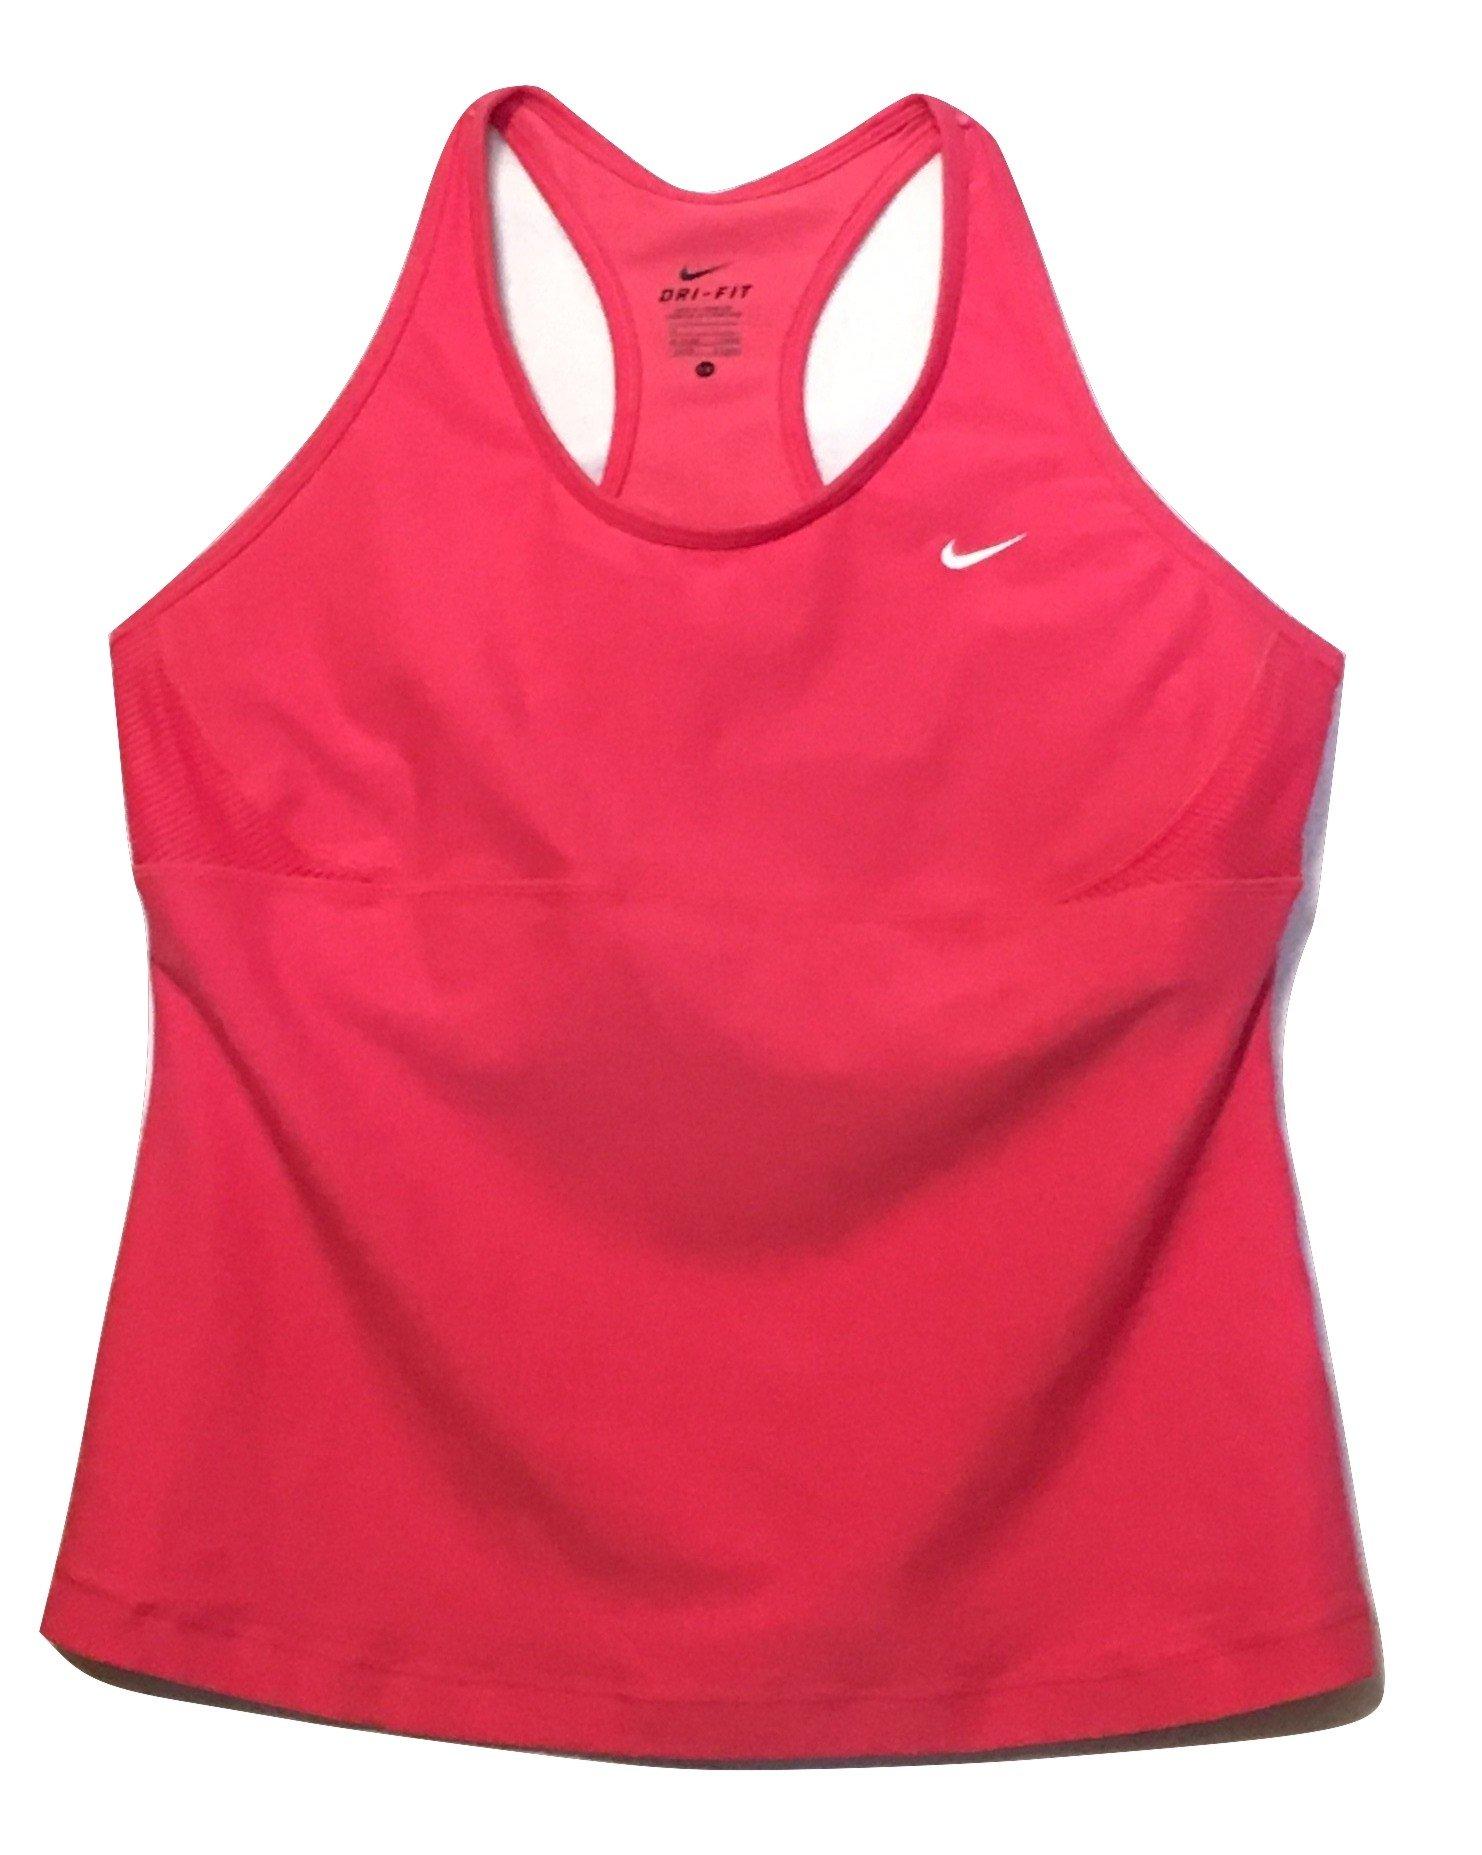 Nike Plus Size DEDICATION Training Medium Impact Top 1X (1X Apparel)